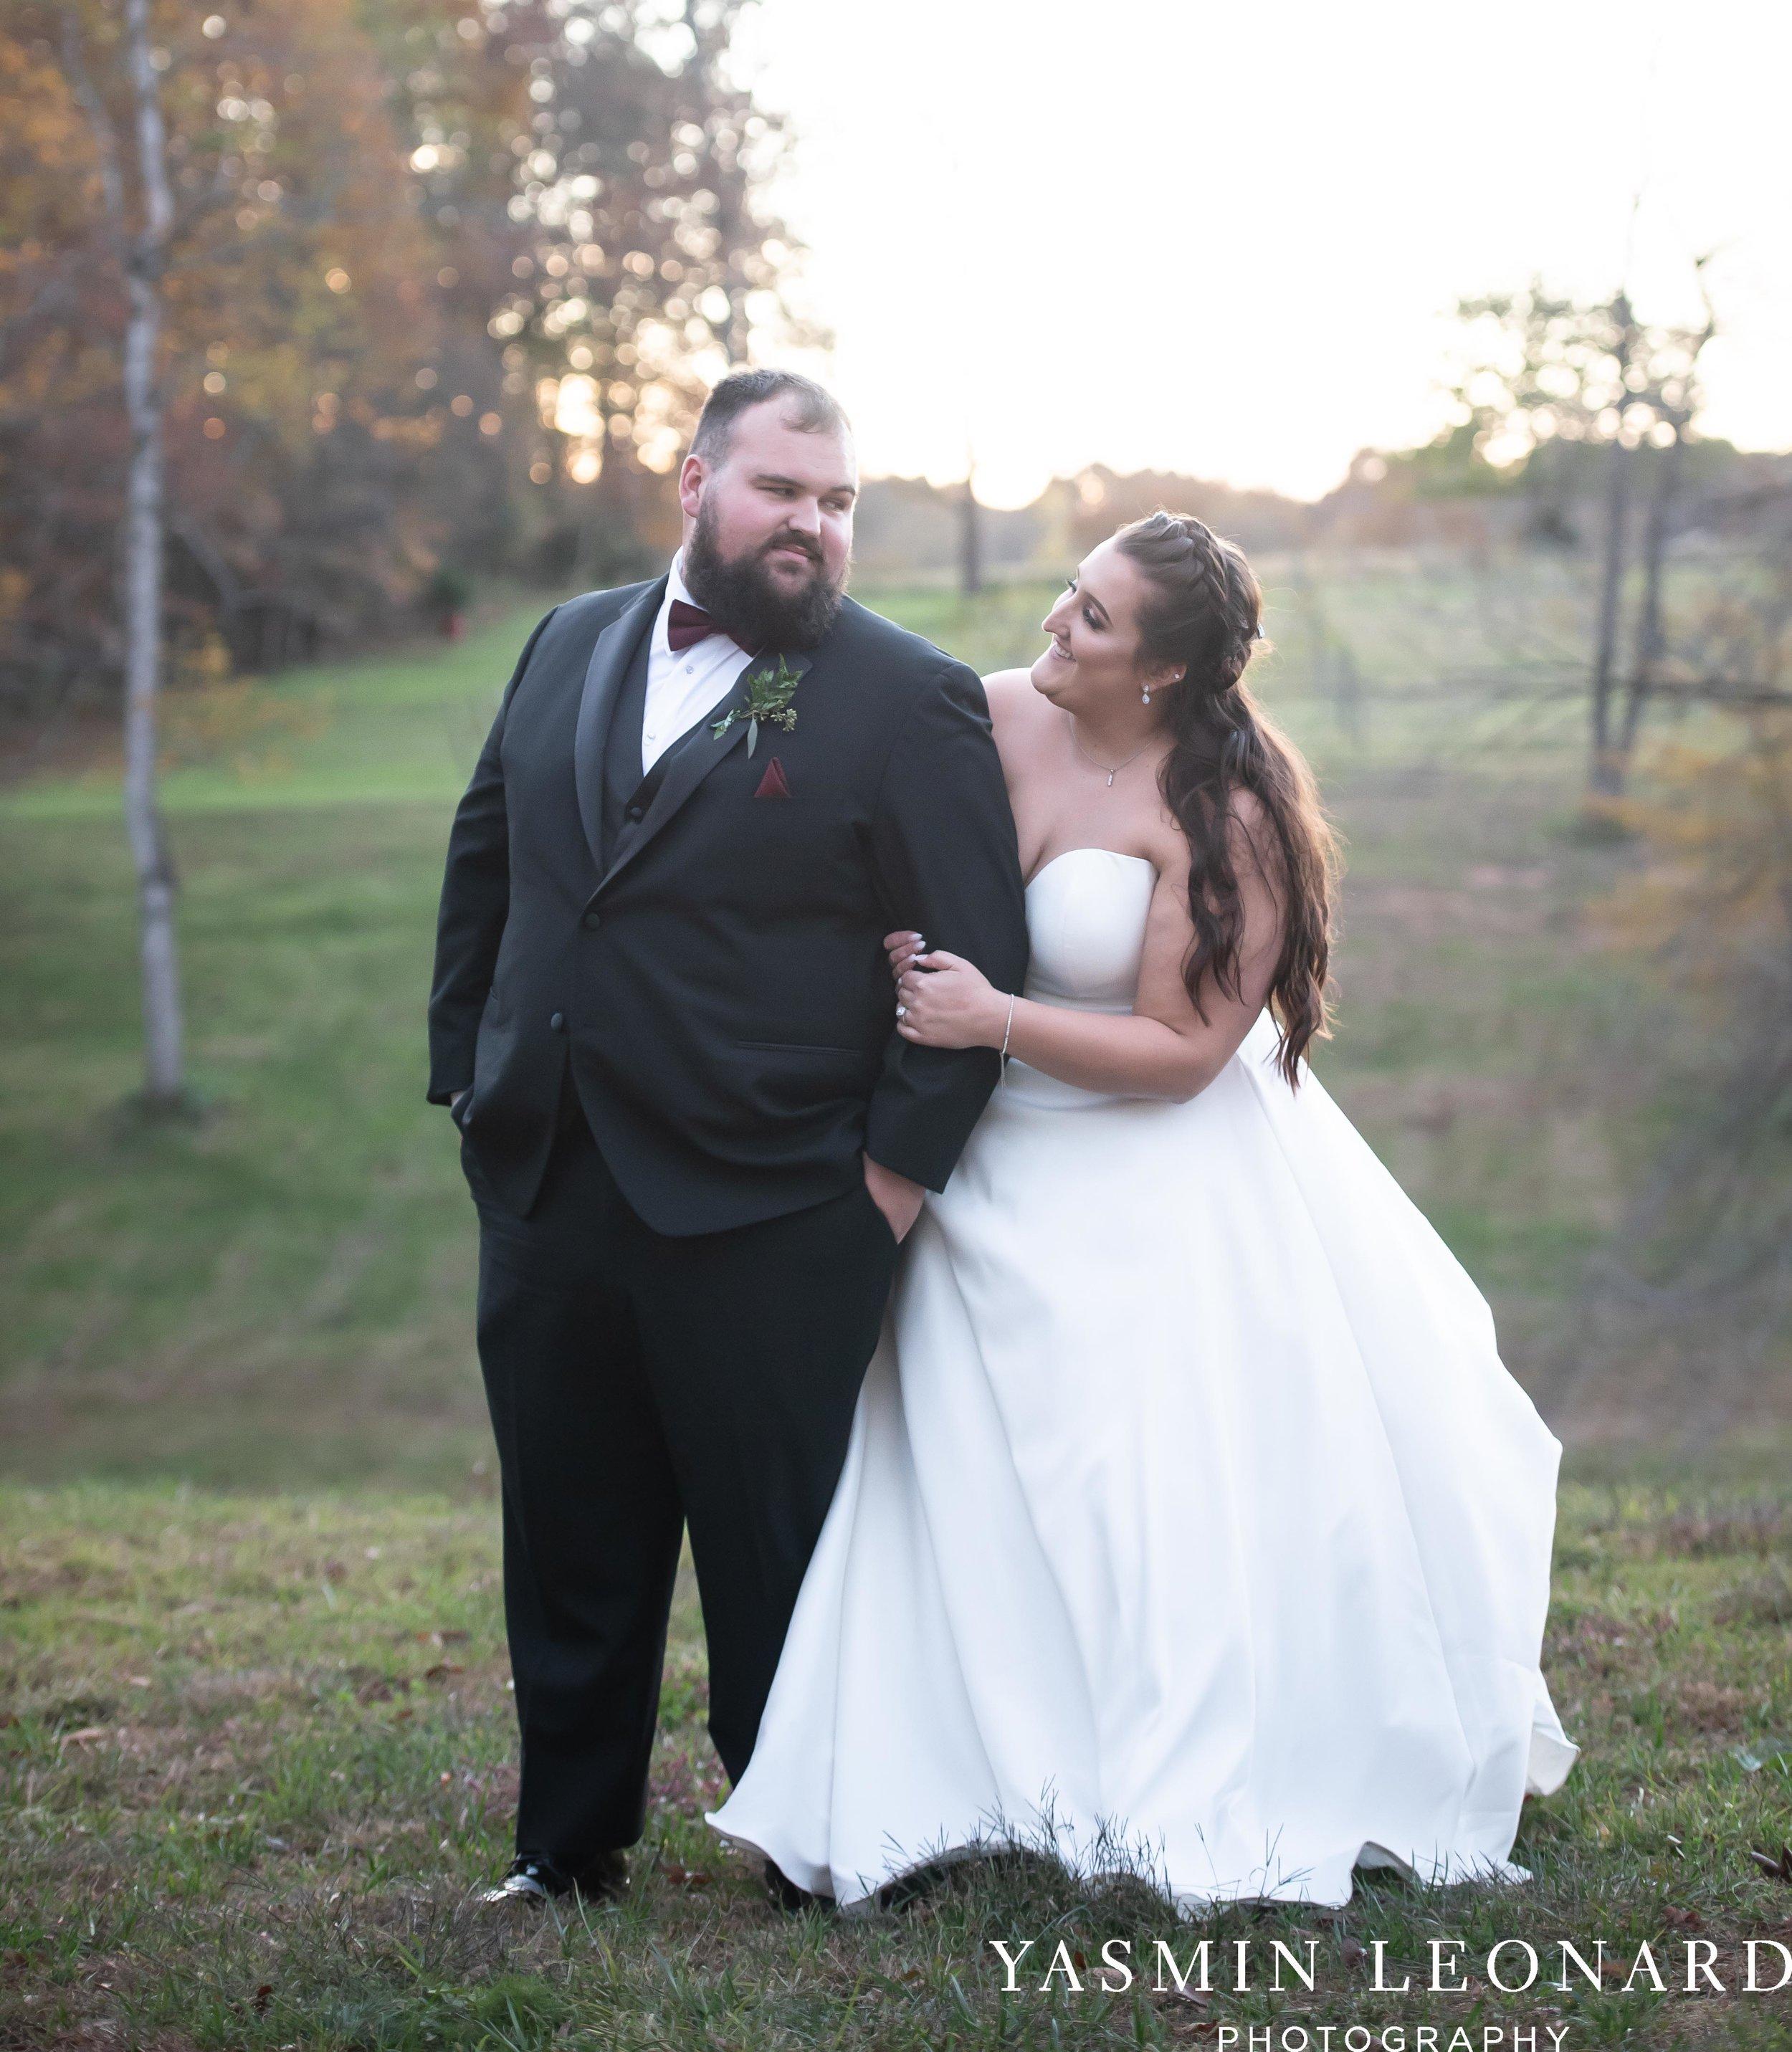 Wesley Memorial United Methodist Church - Old Homeplace Winery - High Point Weddings - High Point Wedding Photographer - NC Weddings - NC Barn Venue - Yasmin Leonard Photography-61.jpg